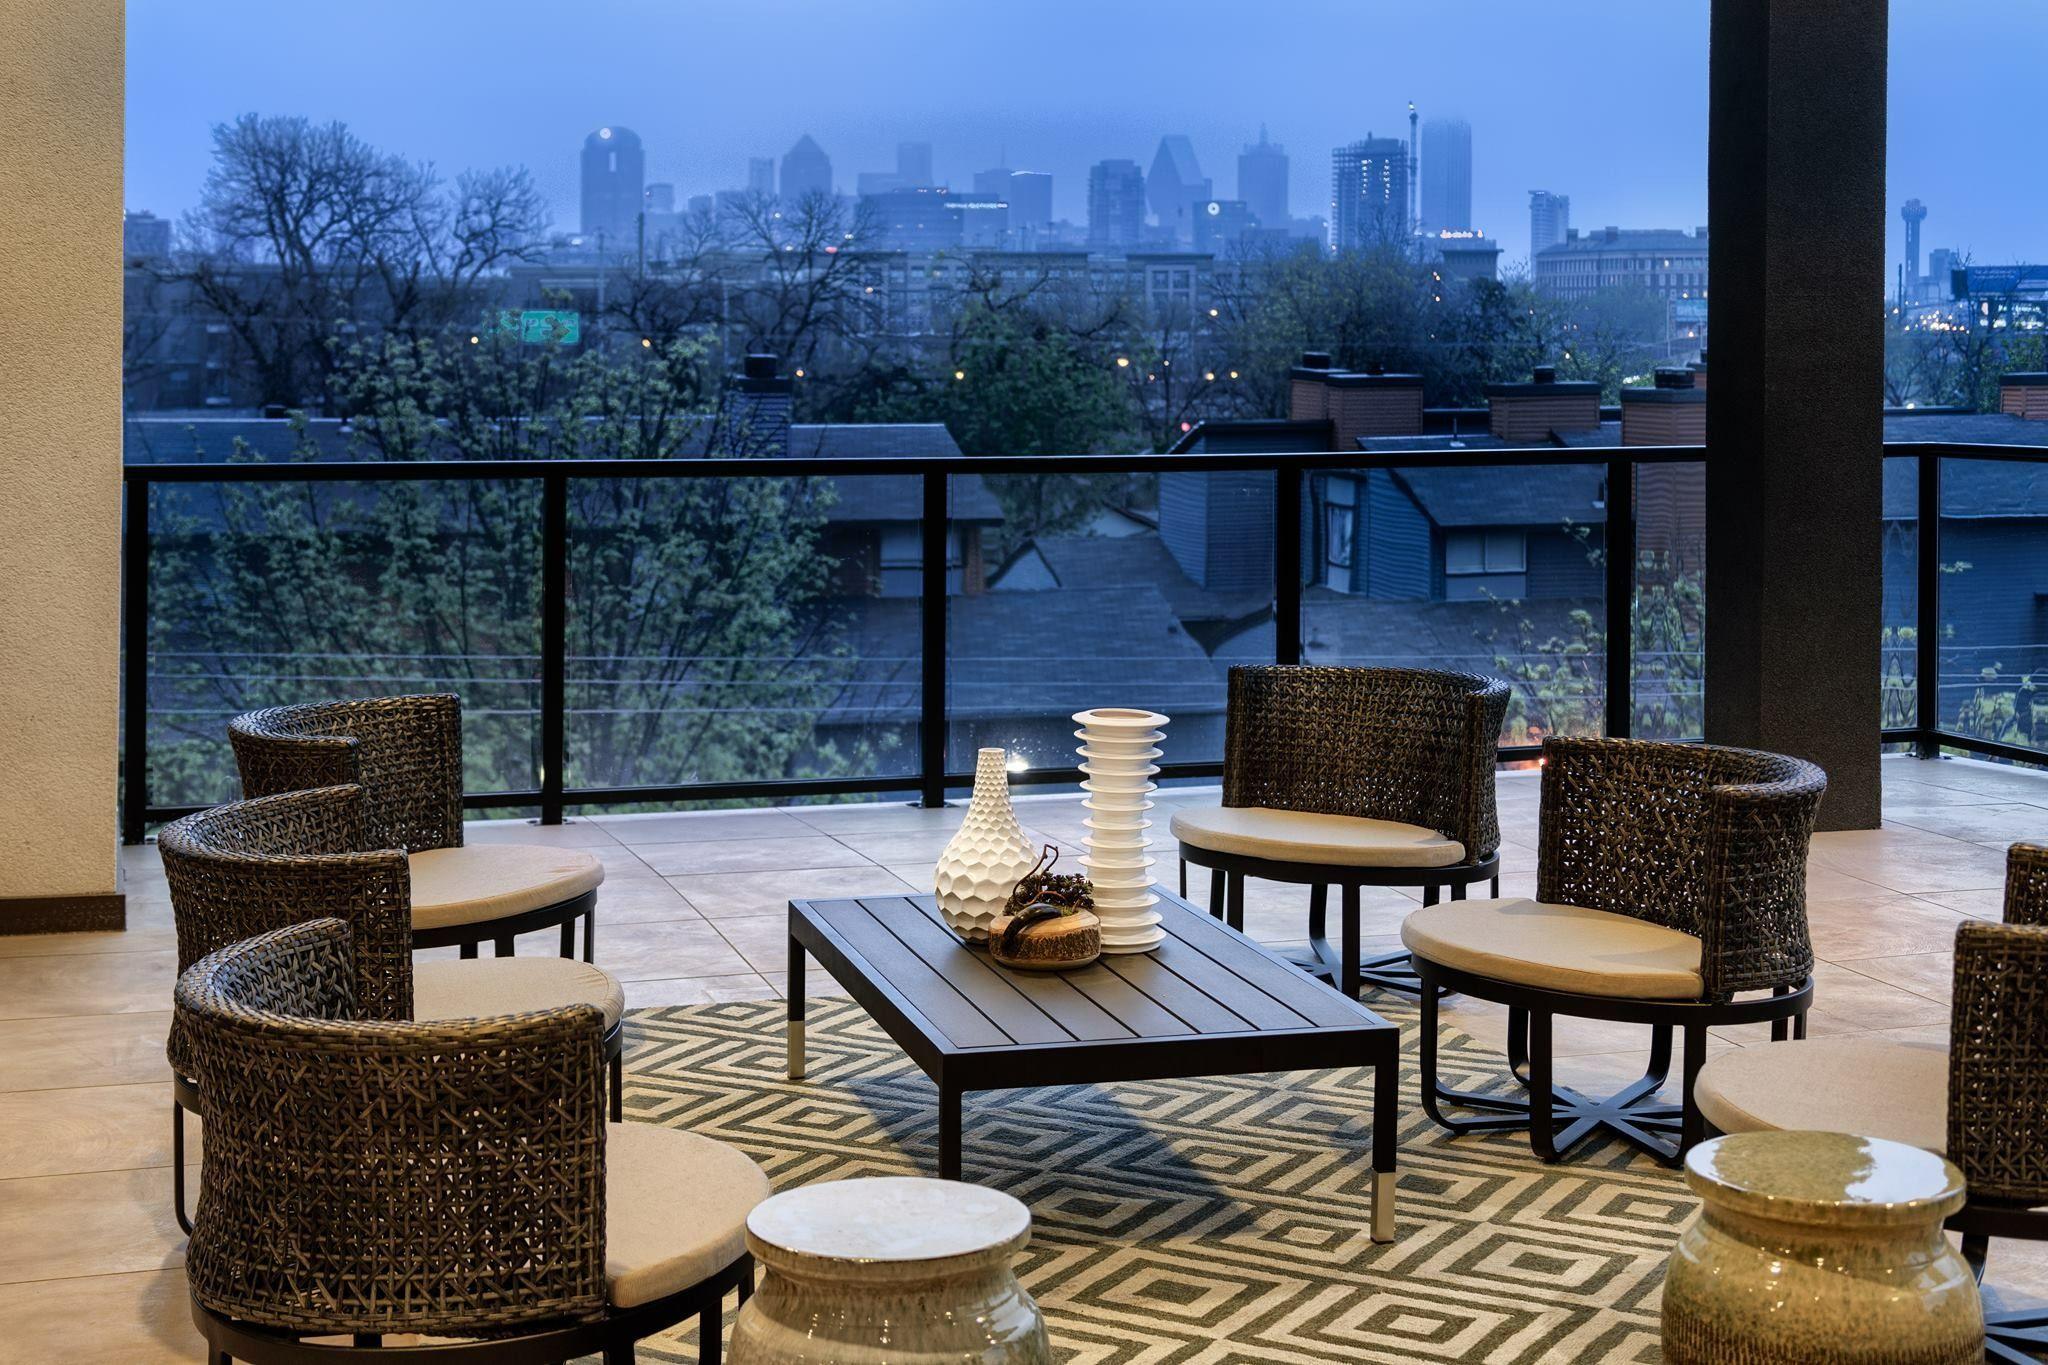 Orlando Round Lounge Chairs Outdoor patio designs